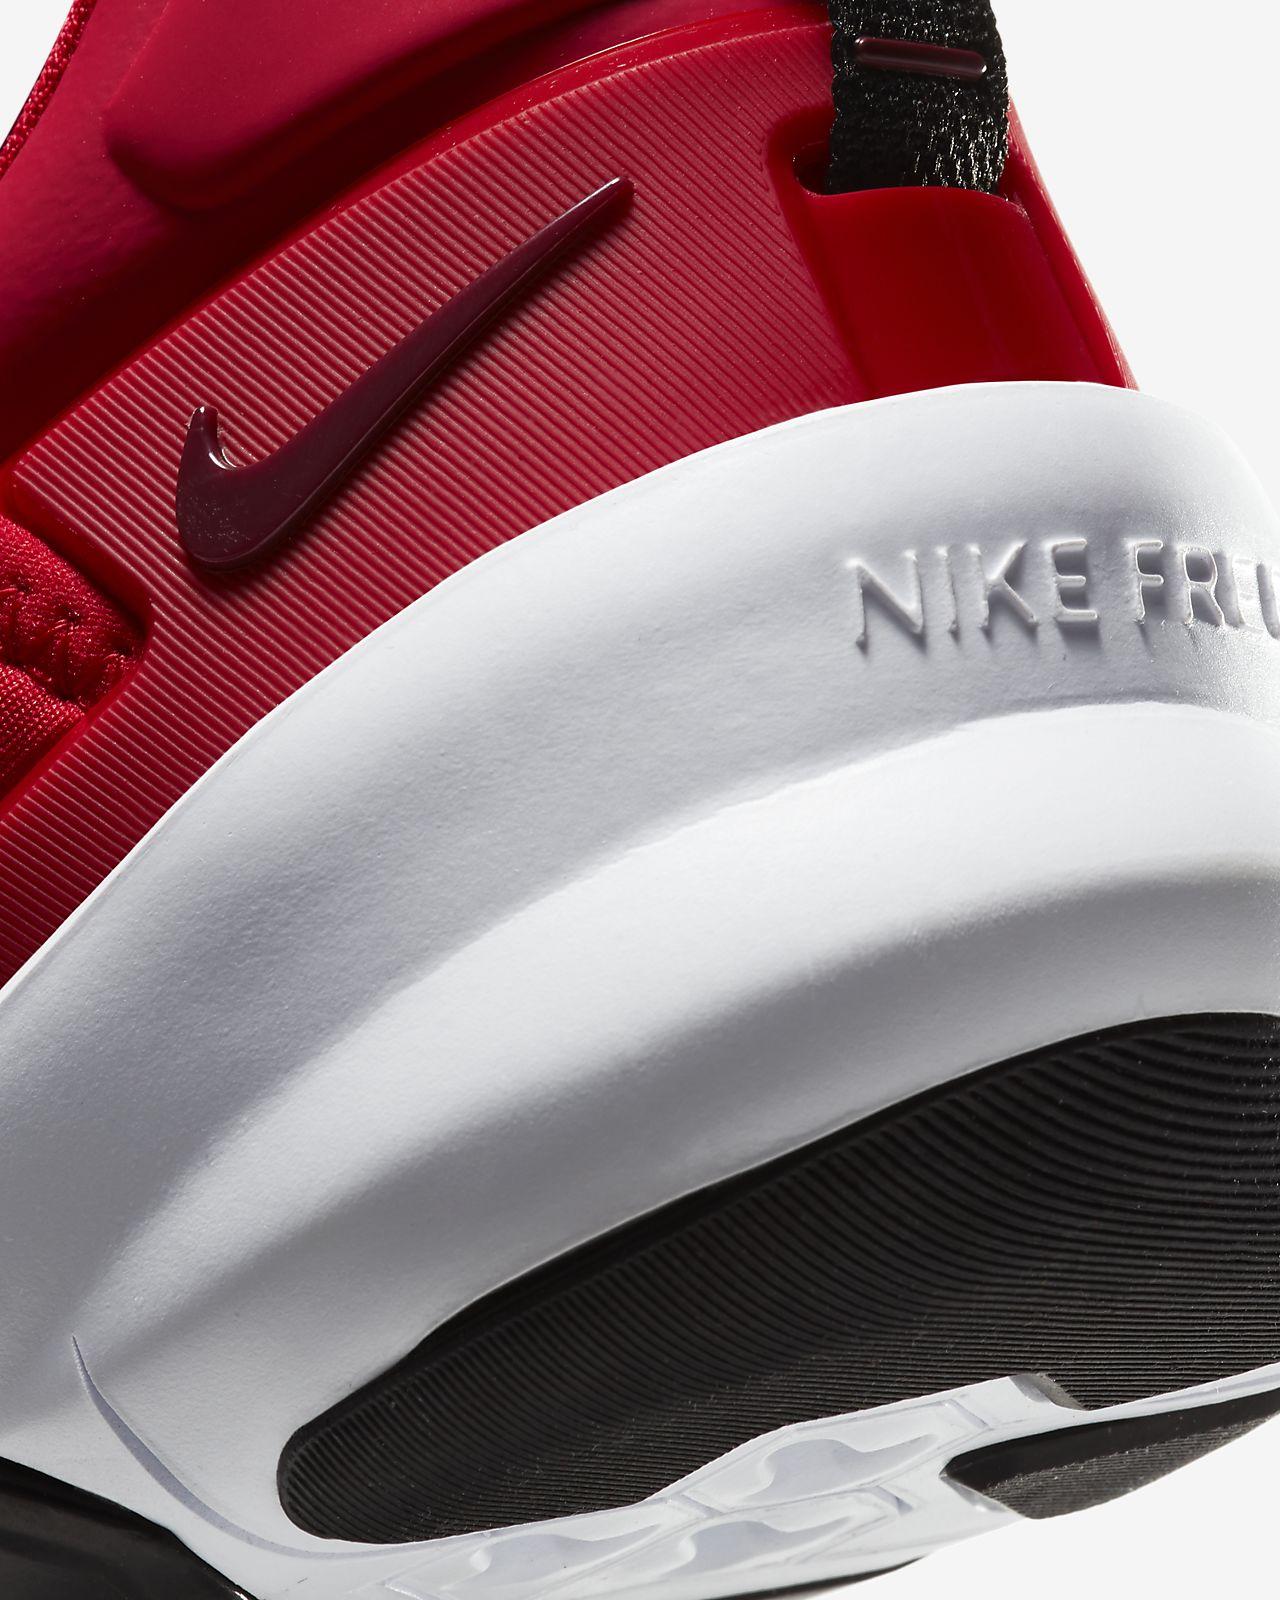 X Chaussure de Nike pour Free Metcon Homme training 2 X8wPnOk0